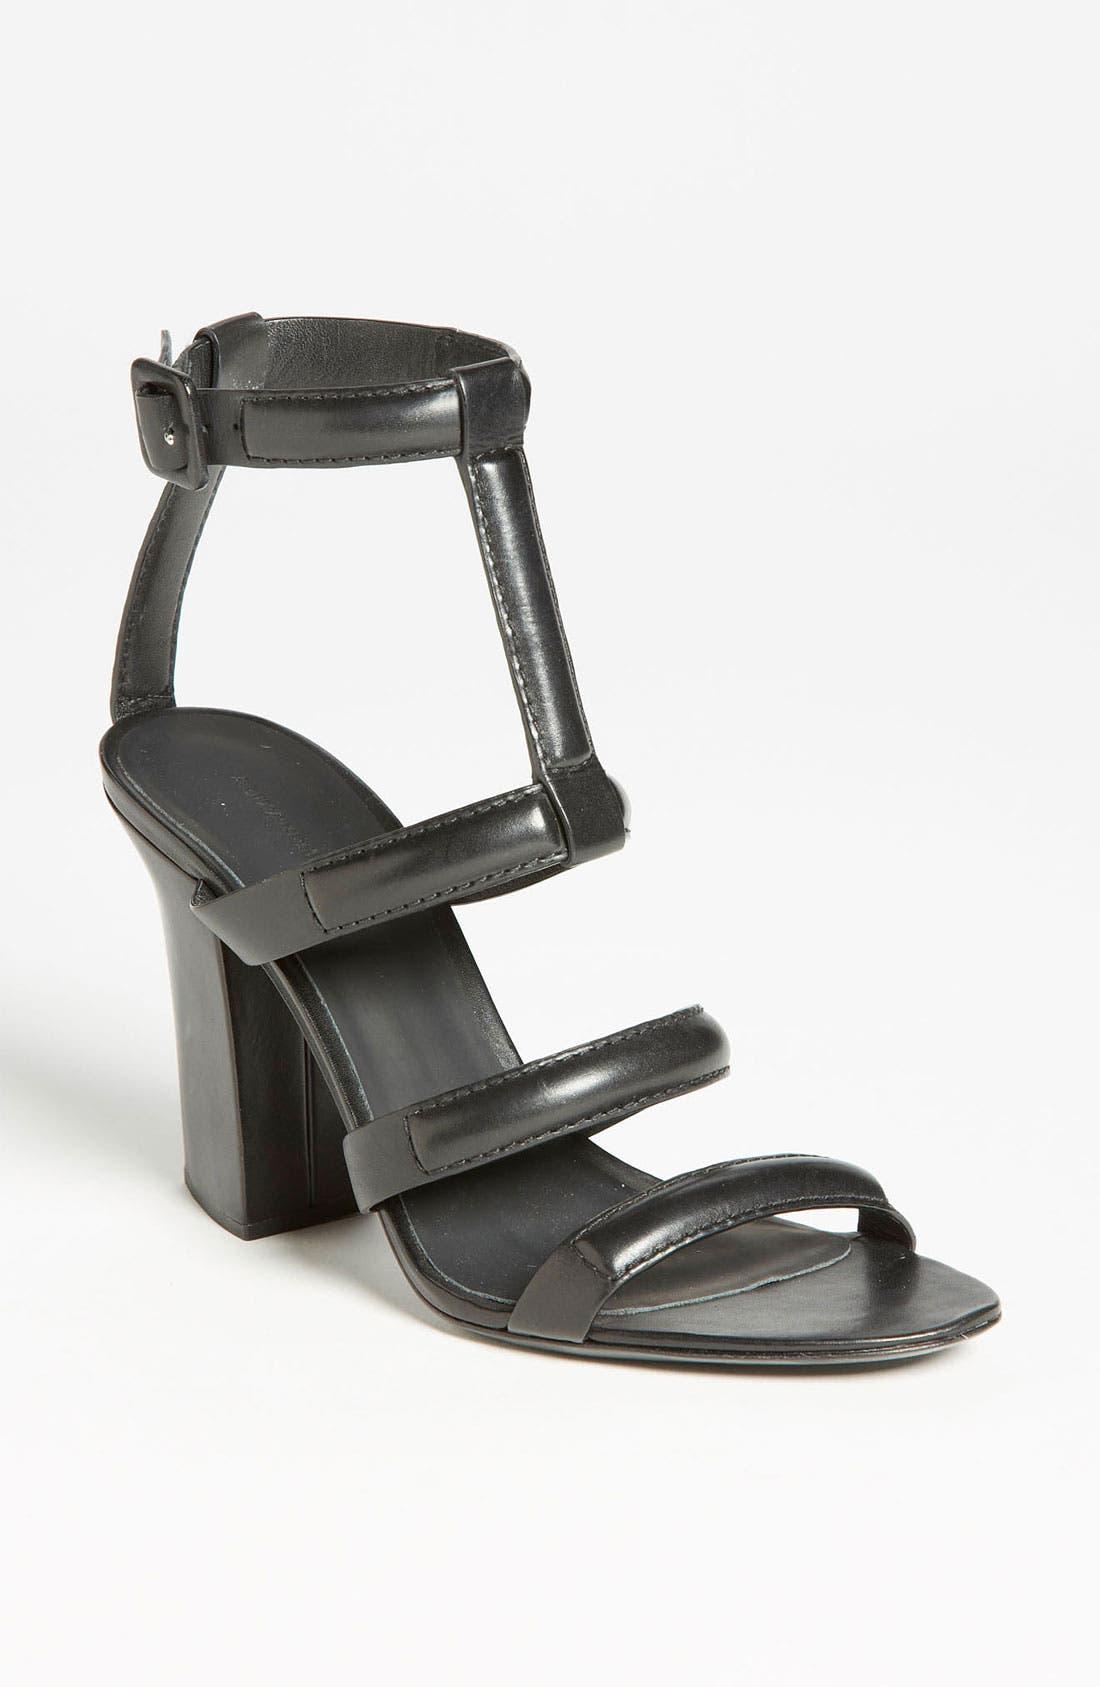 Alternate Image 1 Selected - Alexander Wang 'Anjelika' Sandal